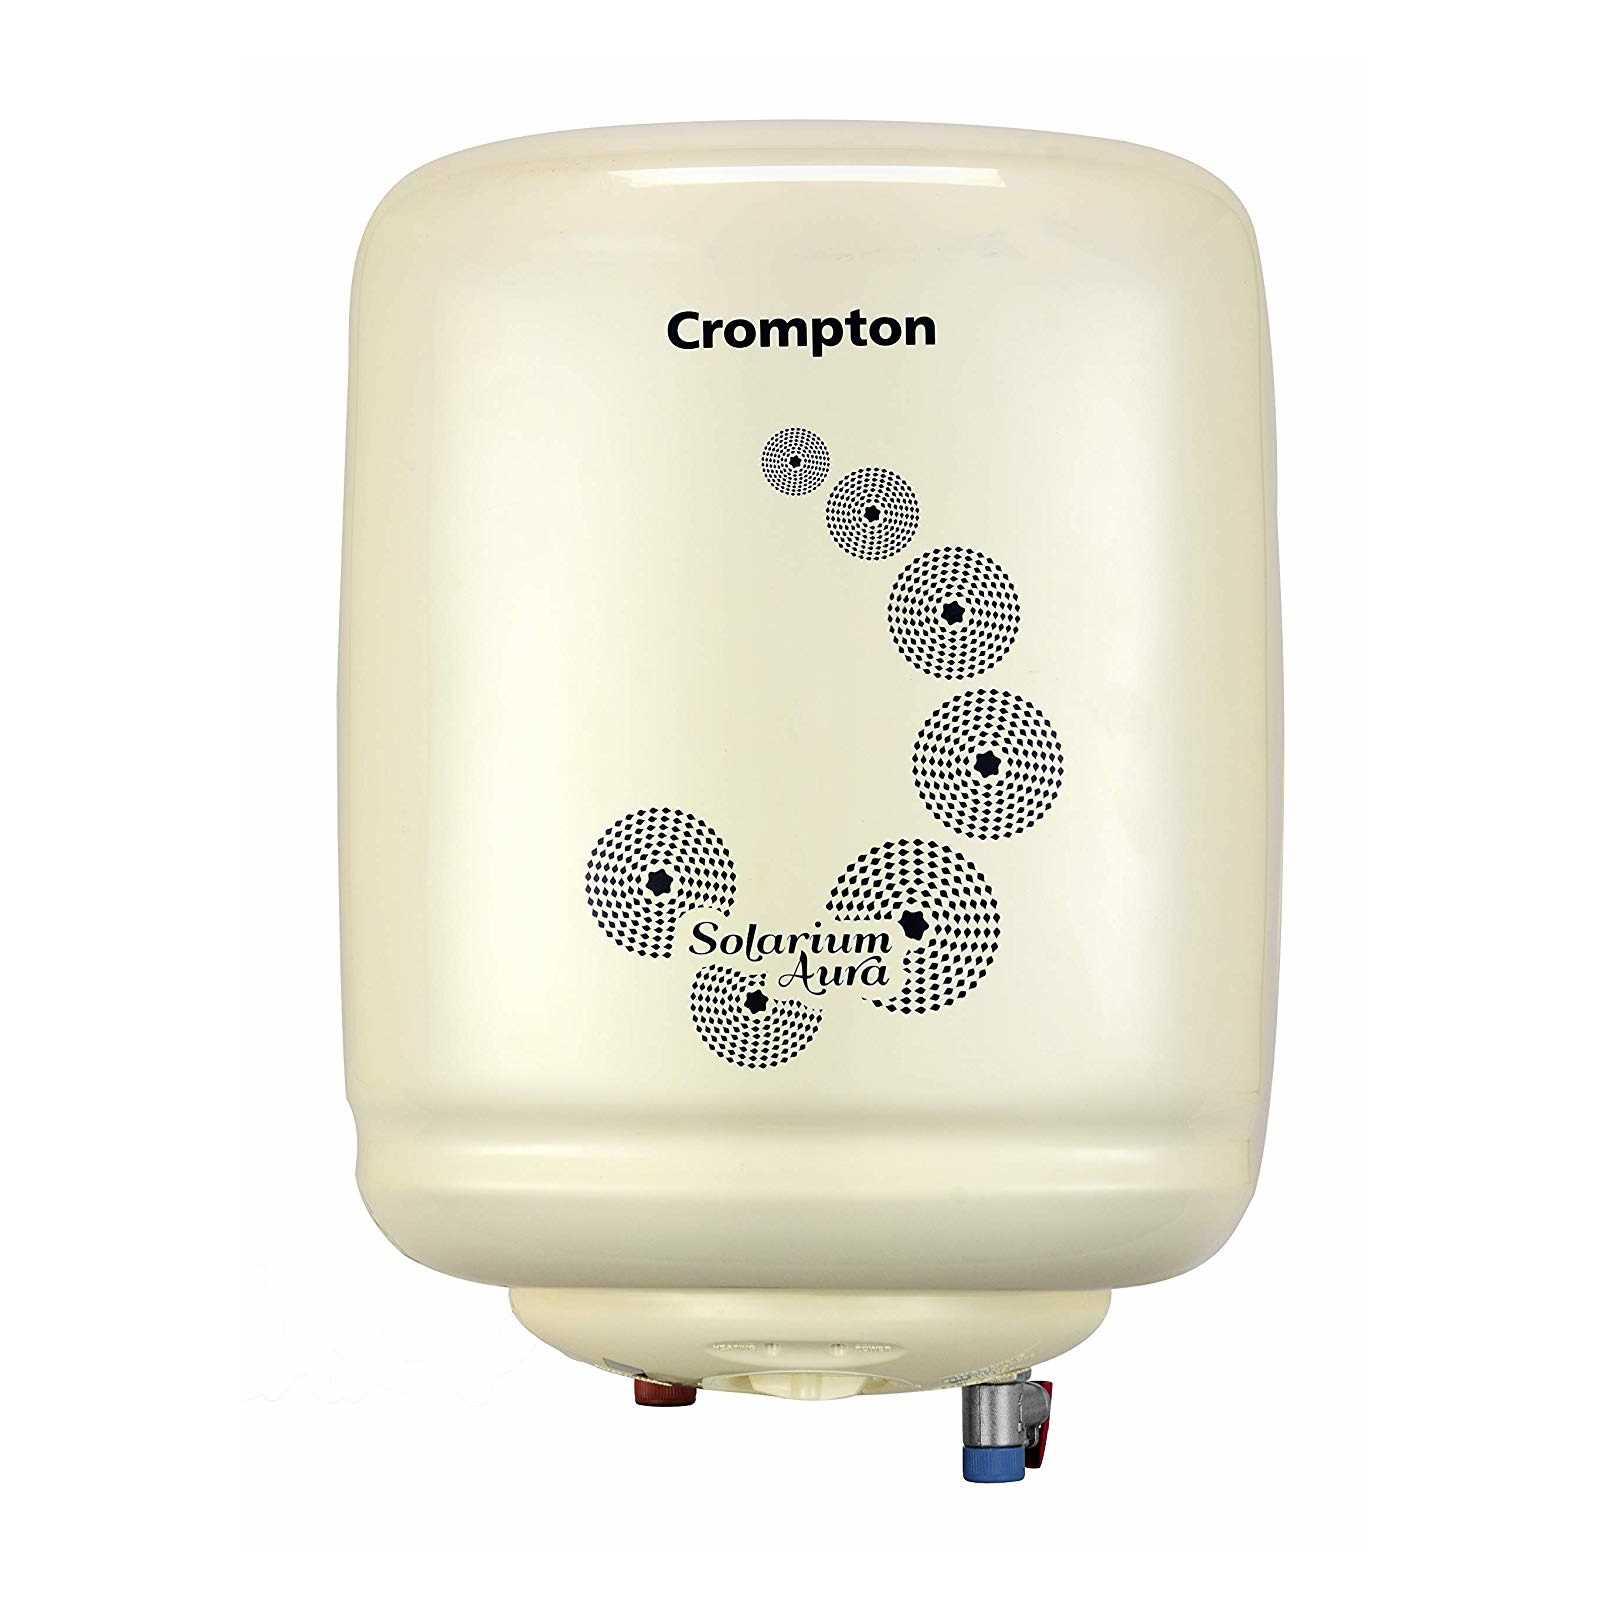 Crompton Solarium Aura 06 Litre Storage Water Heater